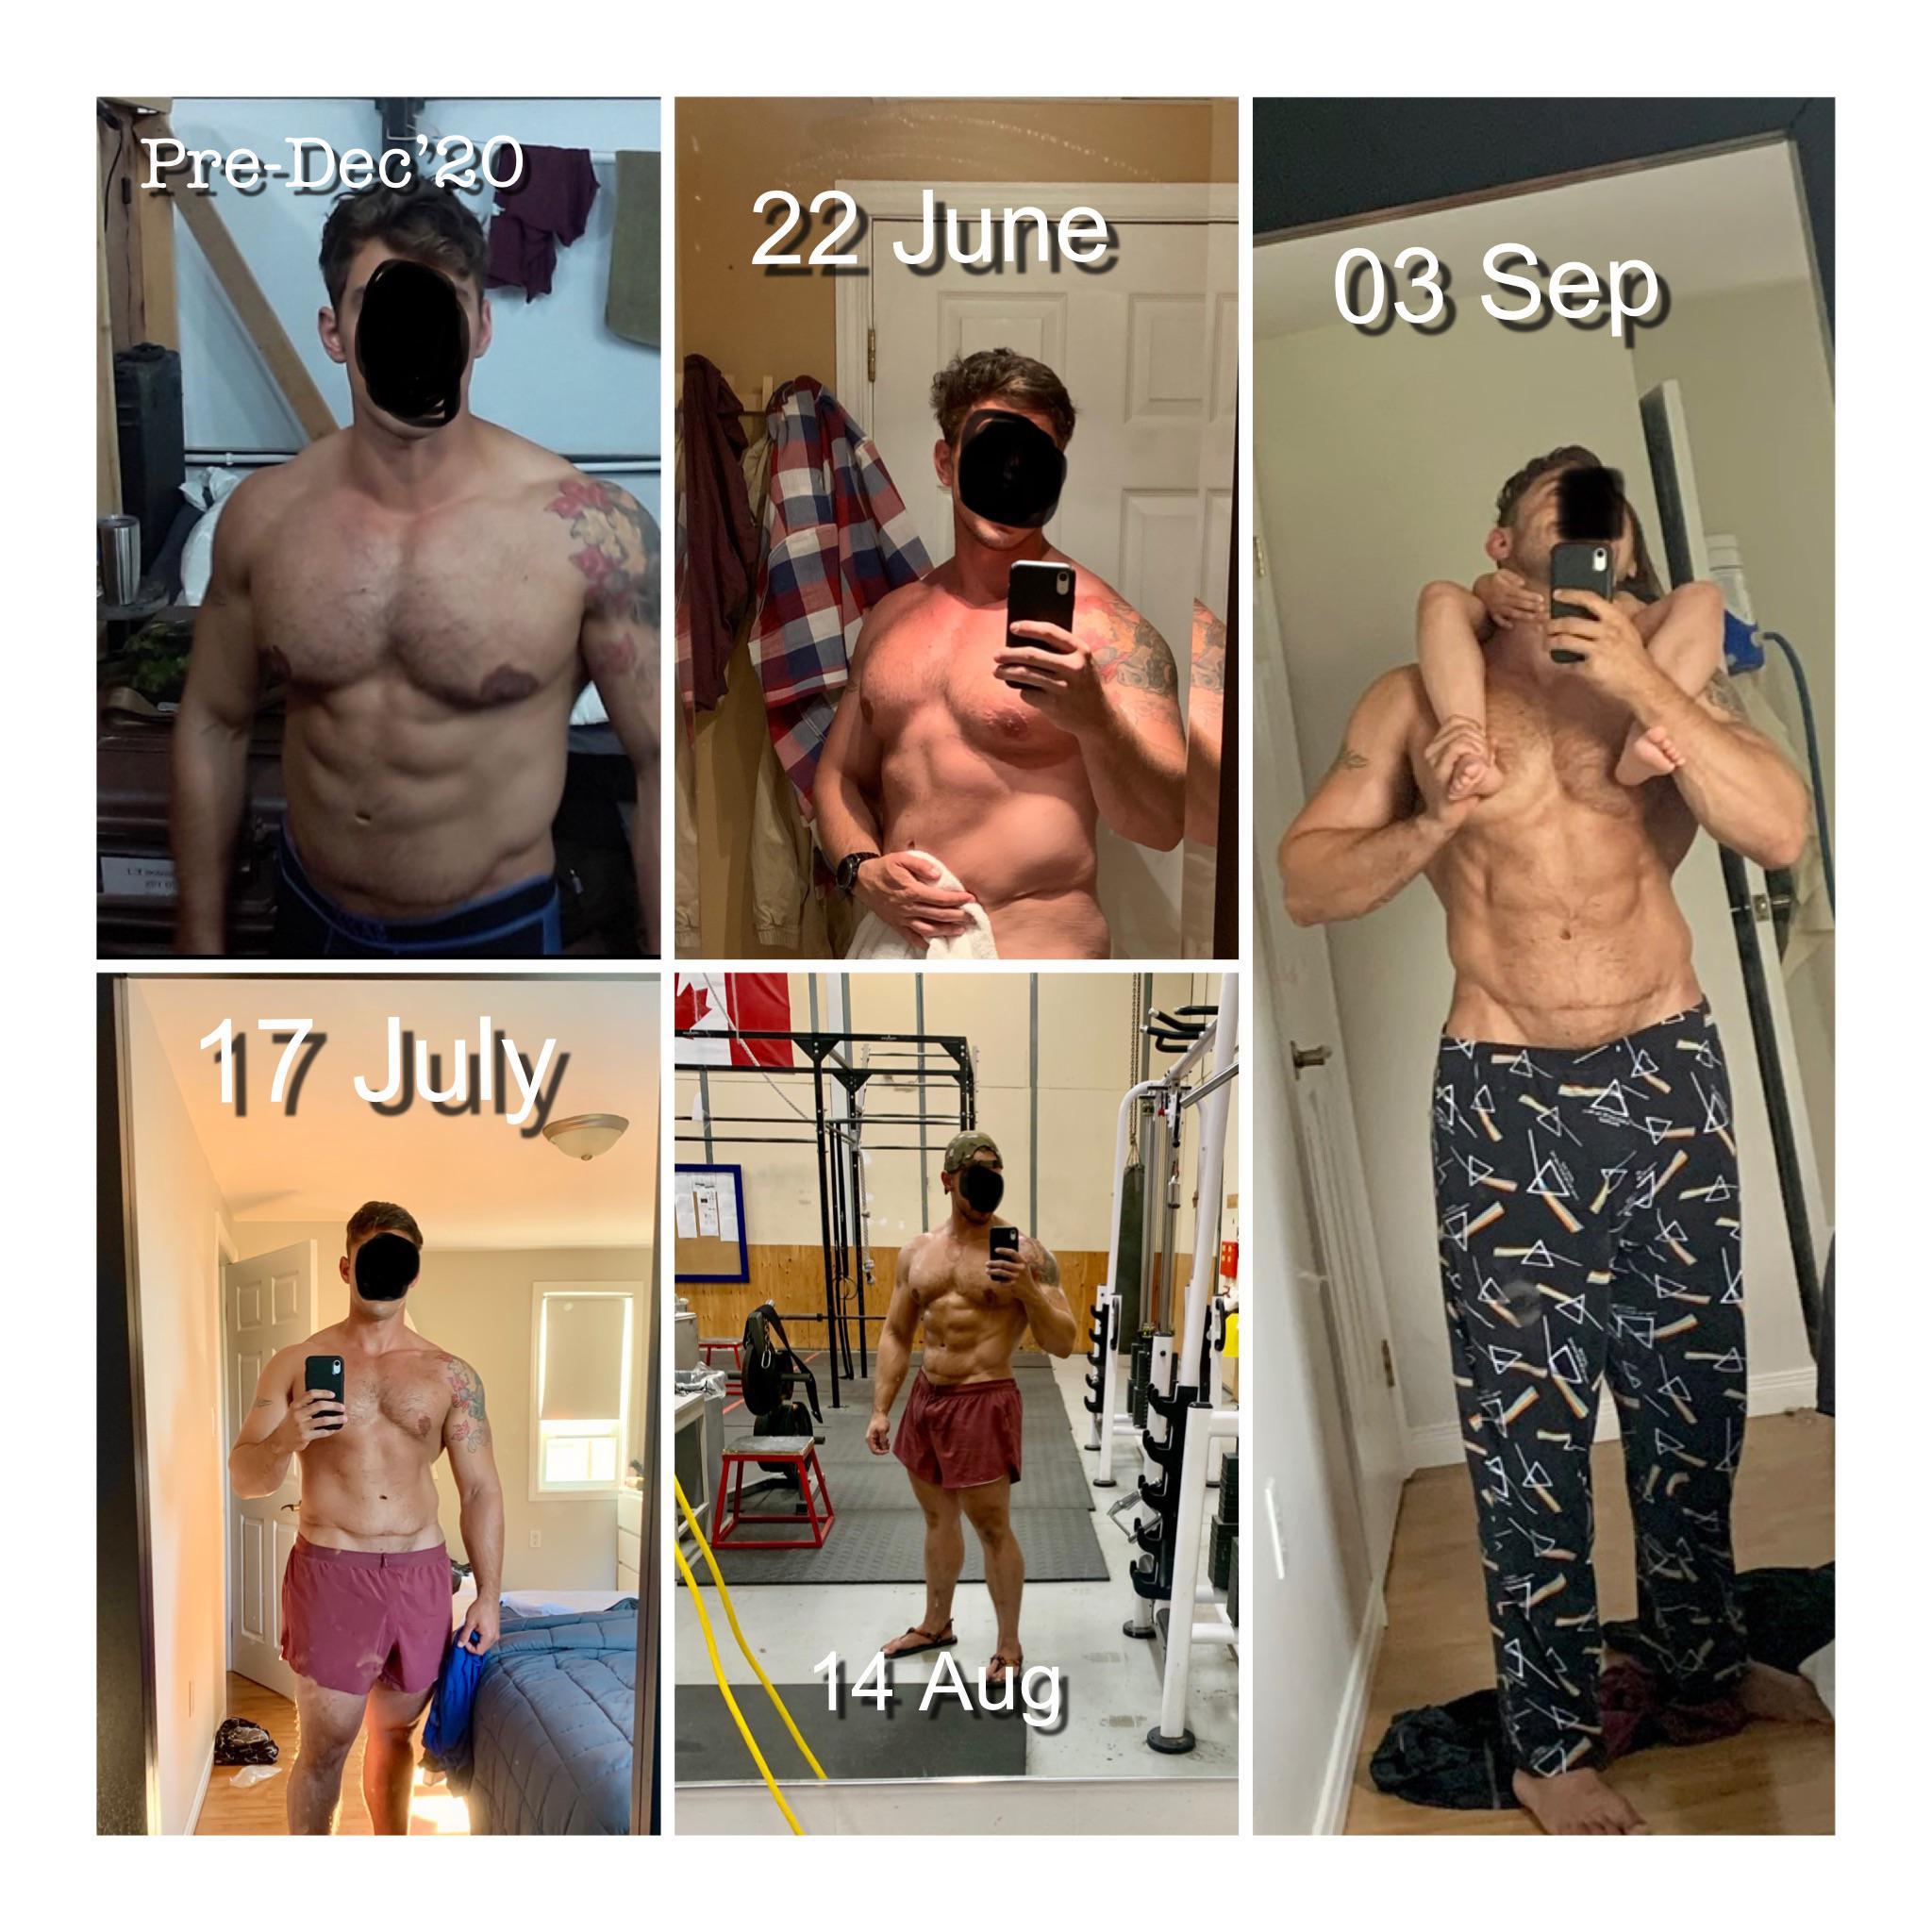 25 lbs Weight Loss 6 foot 1 Male 267 lbs to 242 lbs